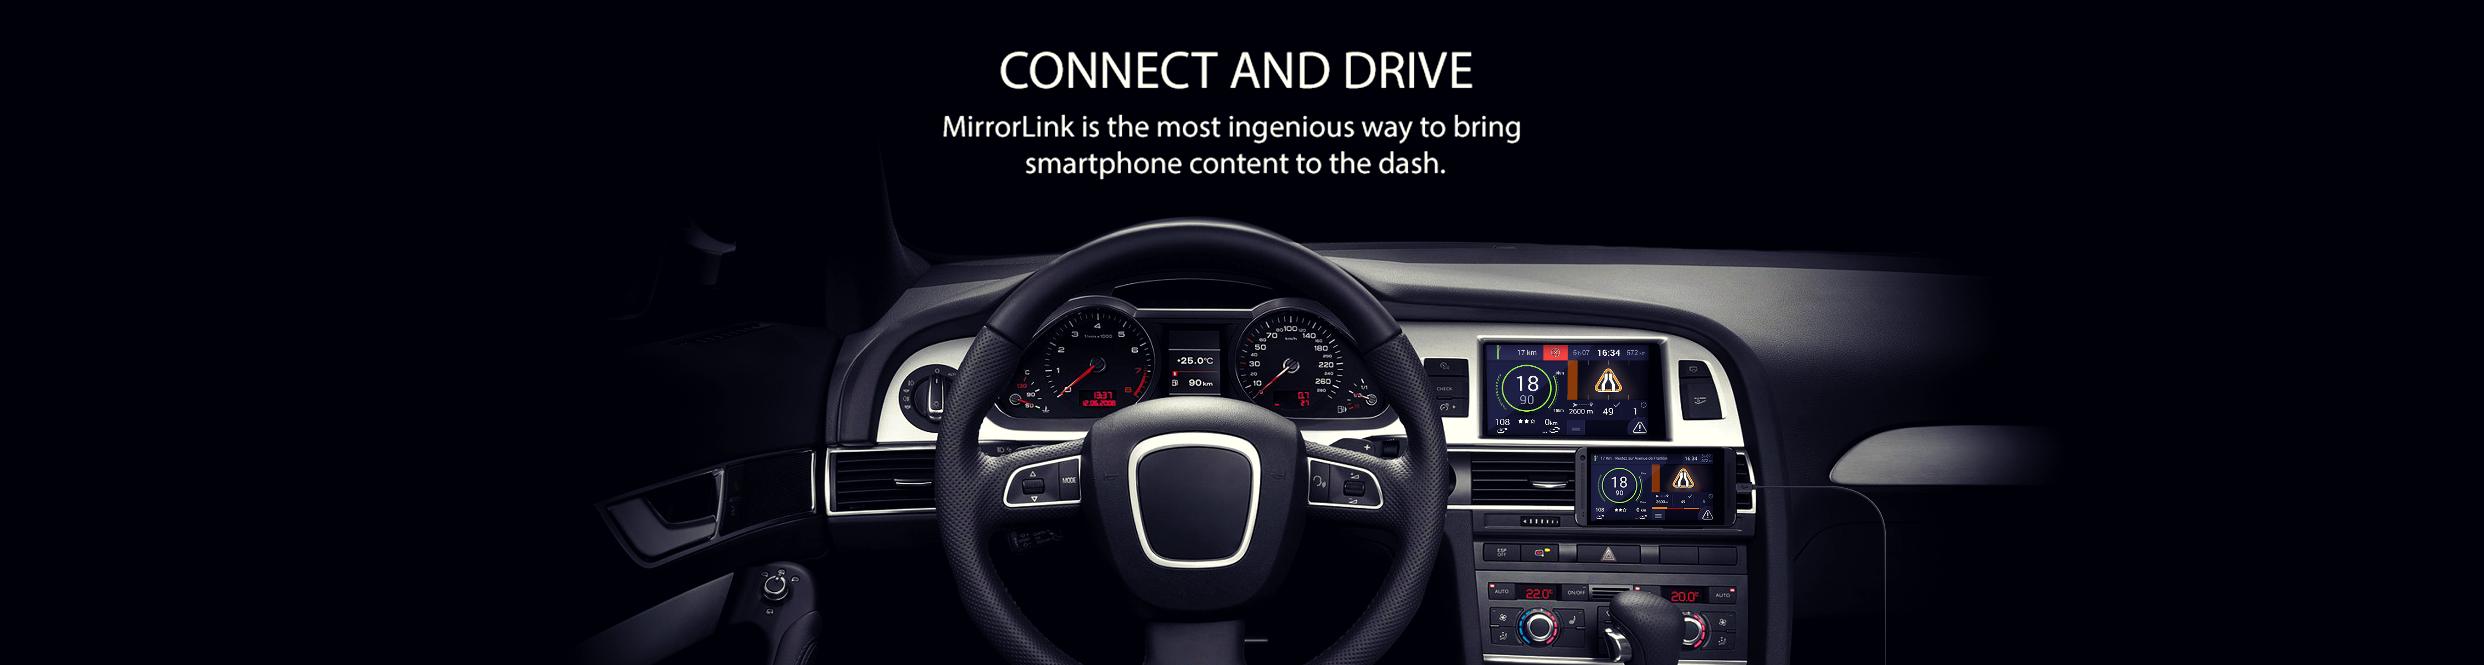 Car Connectivity Consortium Wisetrack Corp